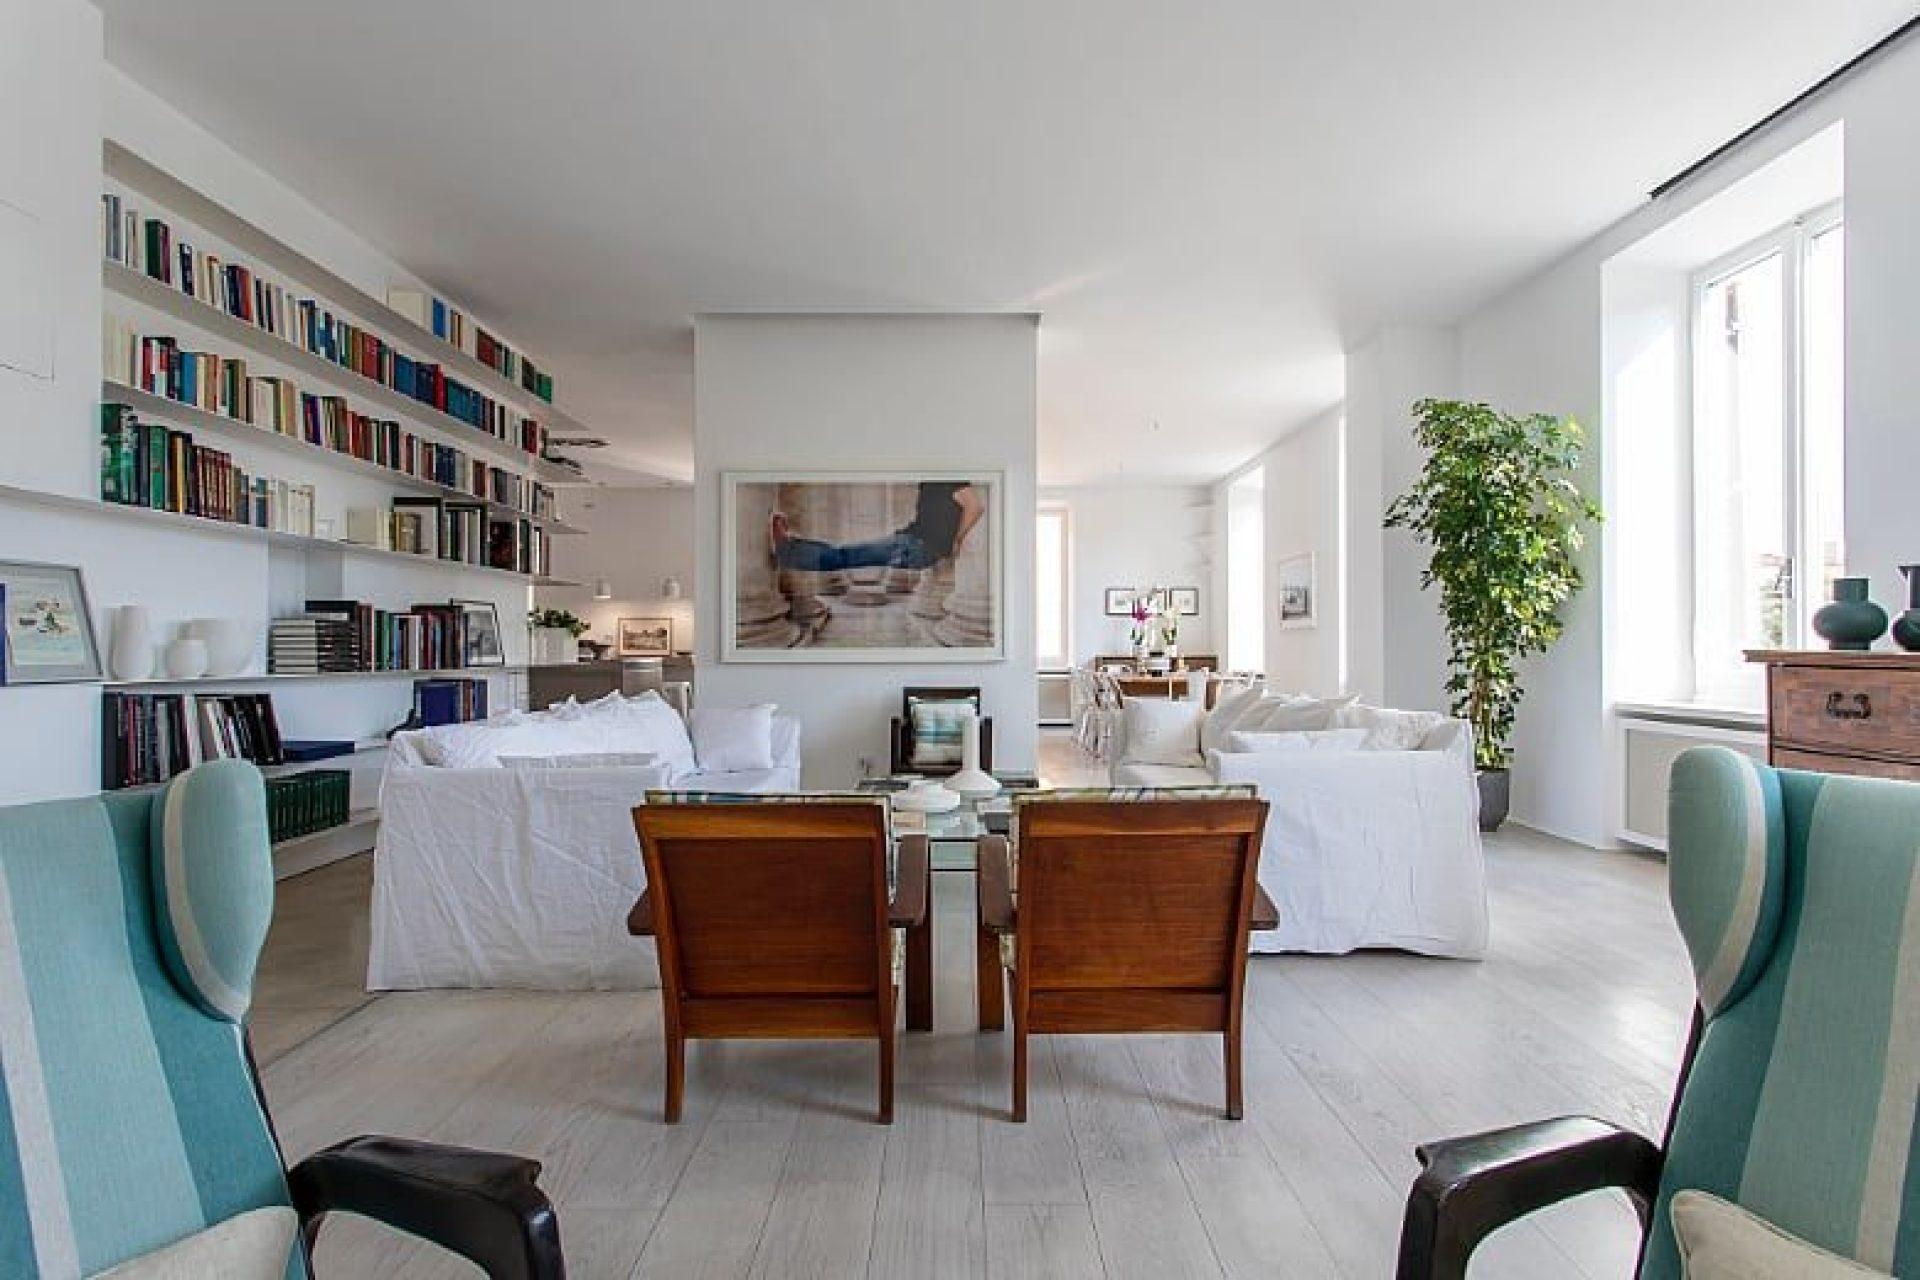 rome-apartments-holiday-apartments-italy-rome-3-780x520-c-center